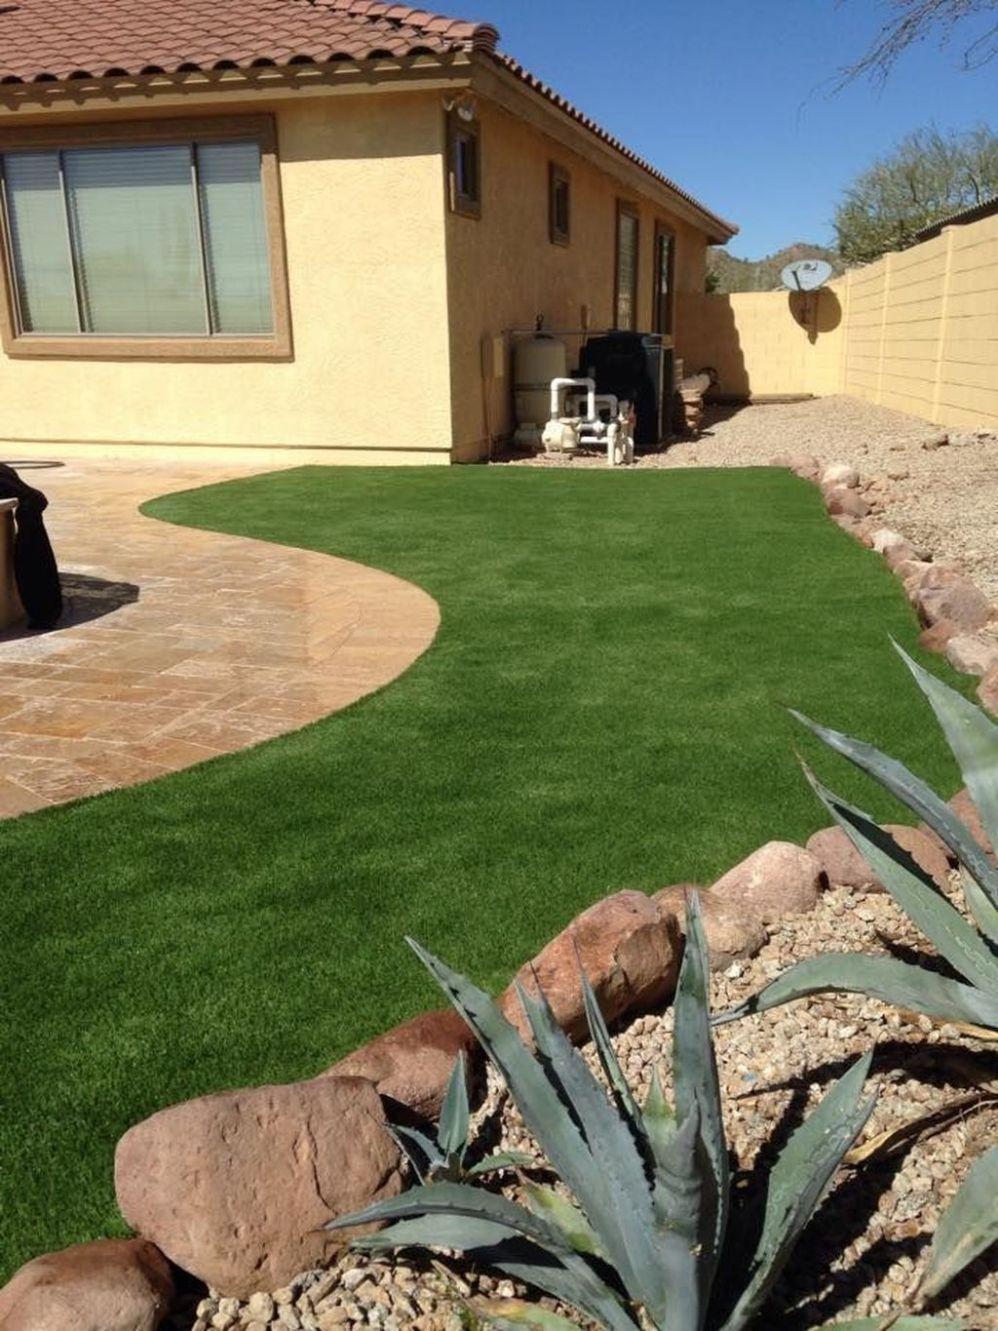 34 Inspiring Arizona Backyard Design Ideas - HOMEPIEZ, # ...